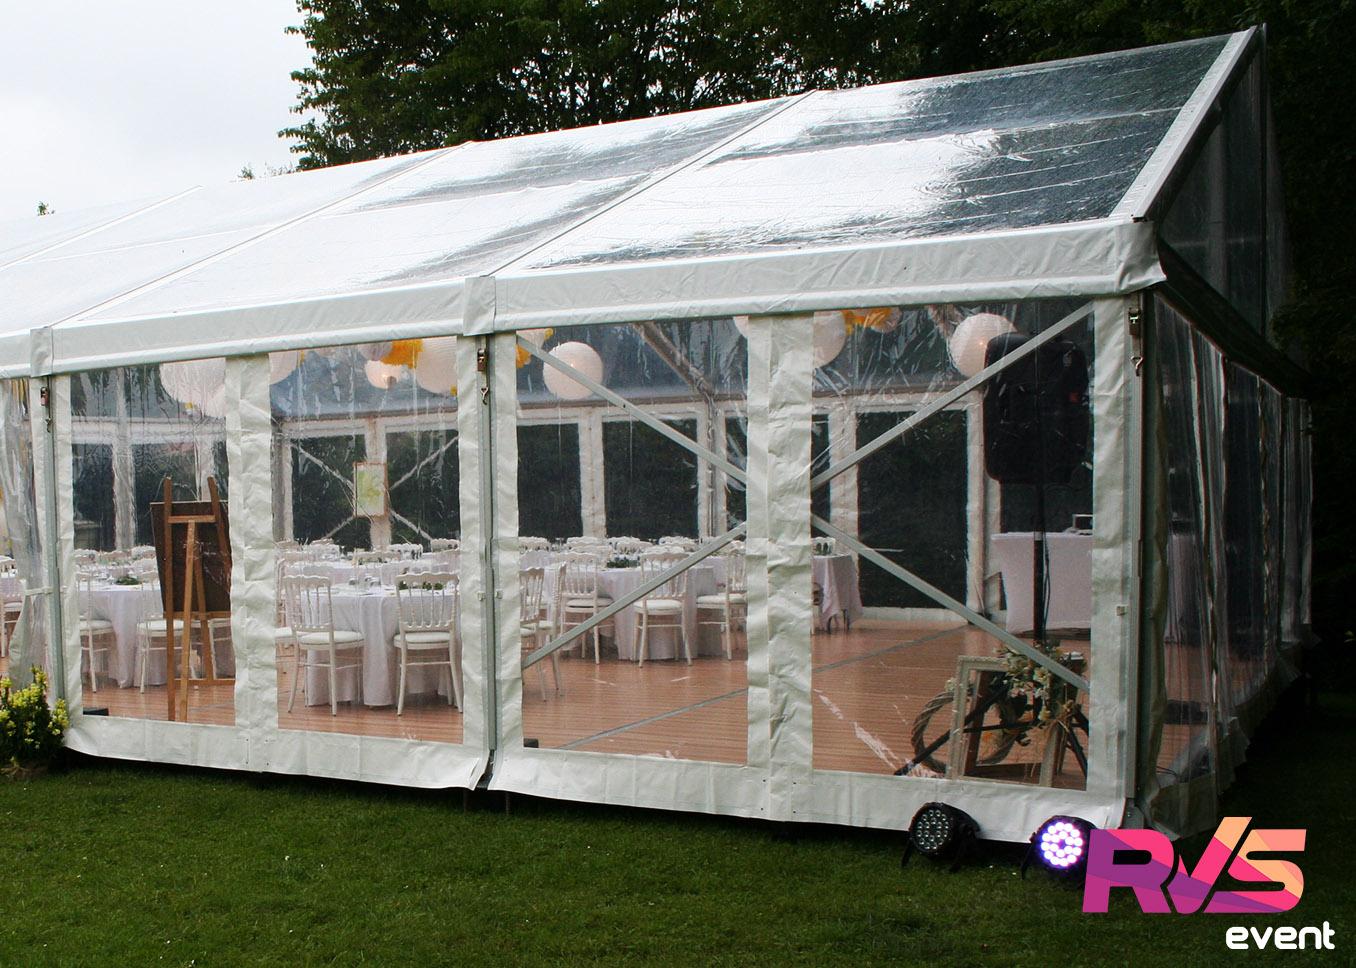 mariage tente de r ception cristal rvs event. Black Bedroom Furniture Sets. Home Design Ideas